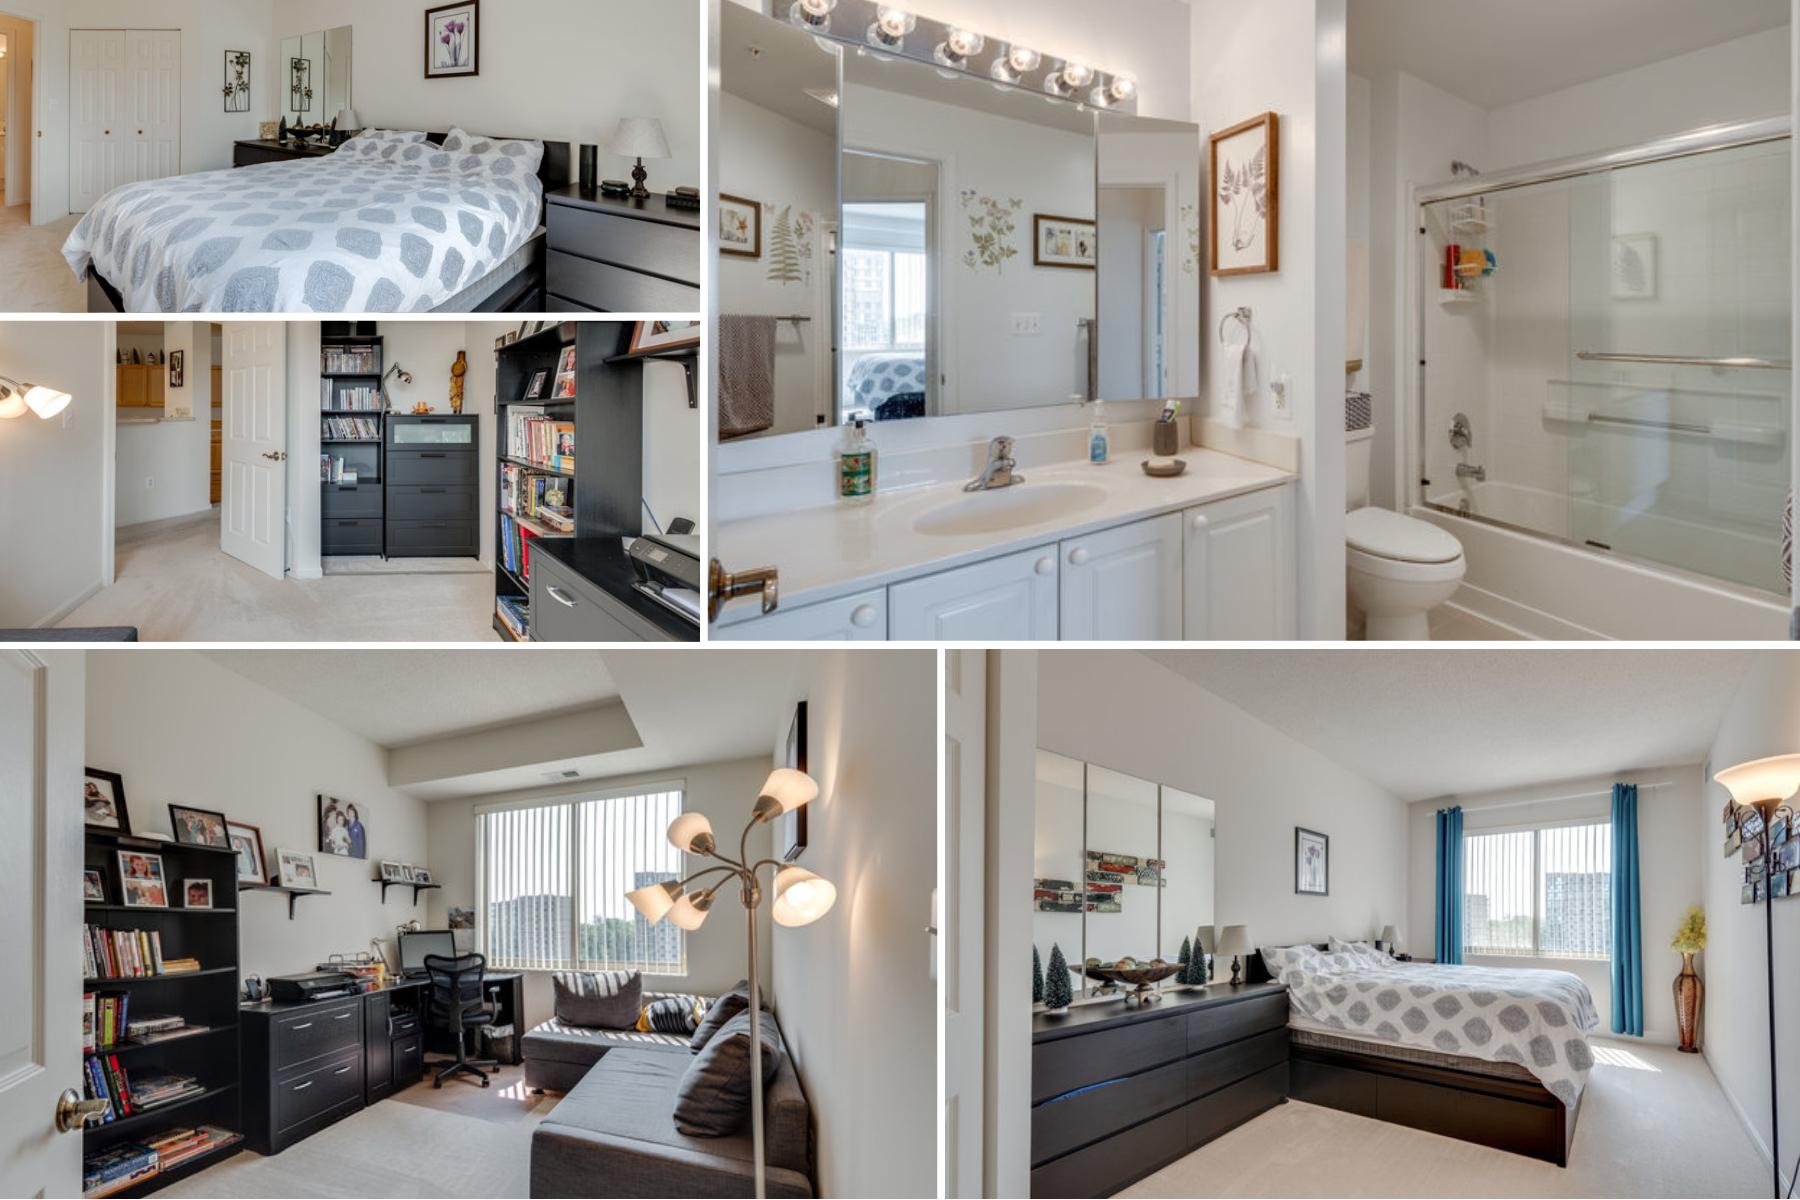 Bedrooms 2 and 3 19365 Cypress Ridge Terrace #415